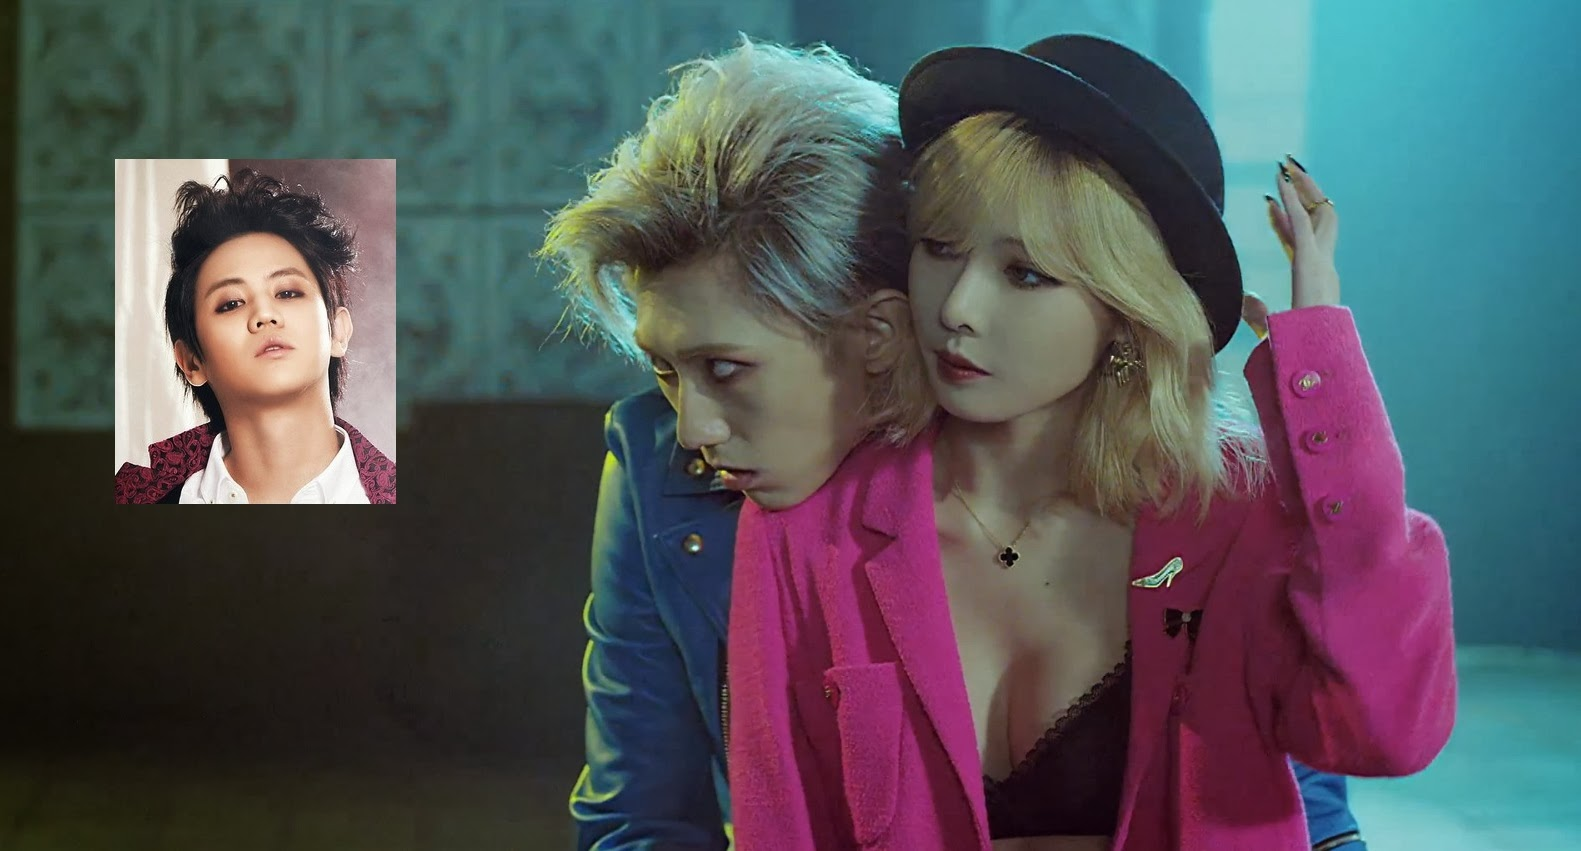 hyunseung and hyuna dating 2014